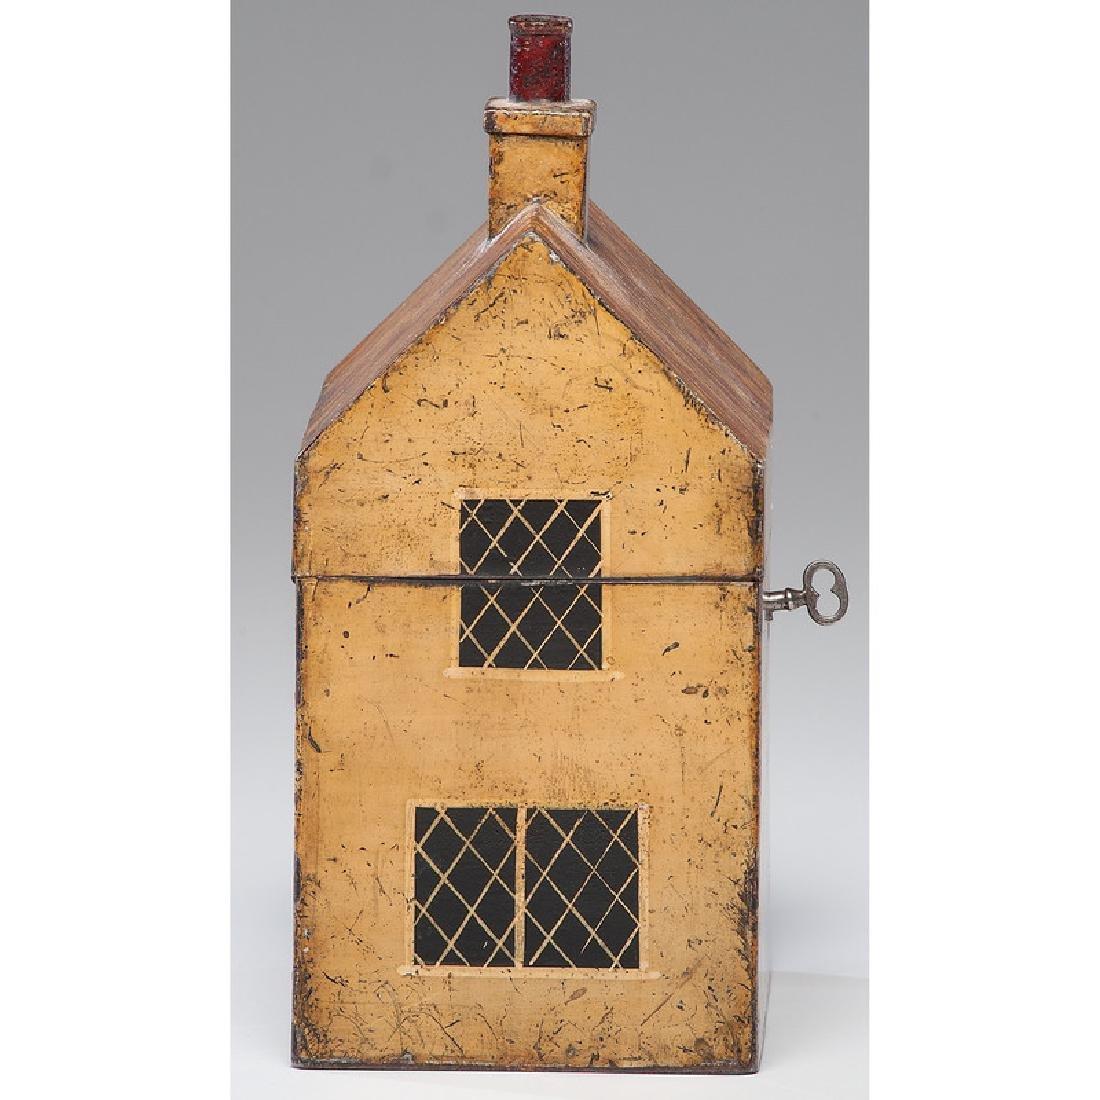 Rare Toleware Cottage Form Tea Caddy - 3